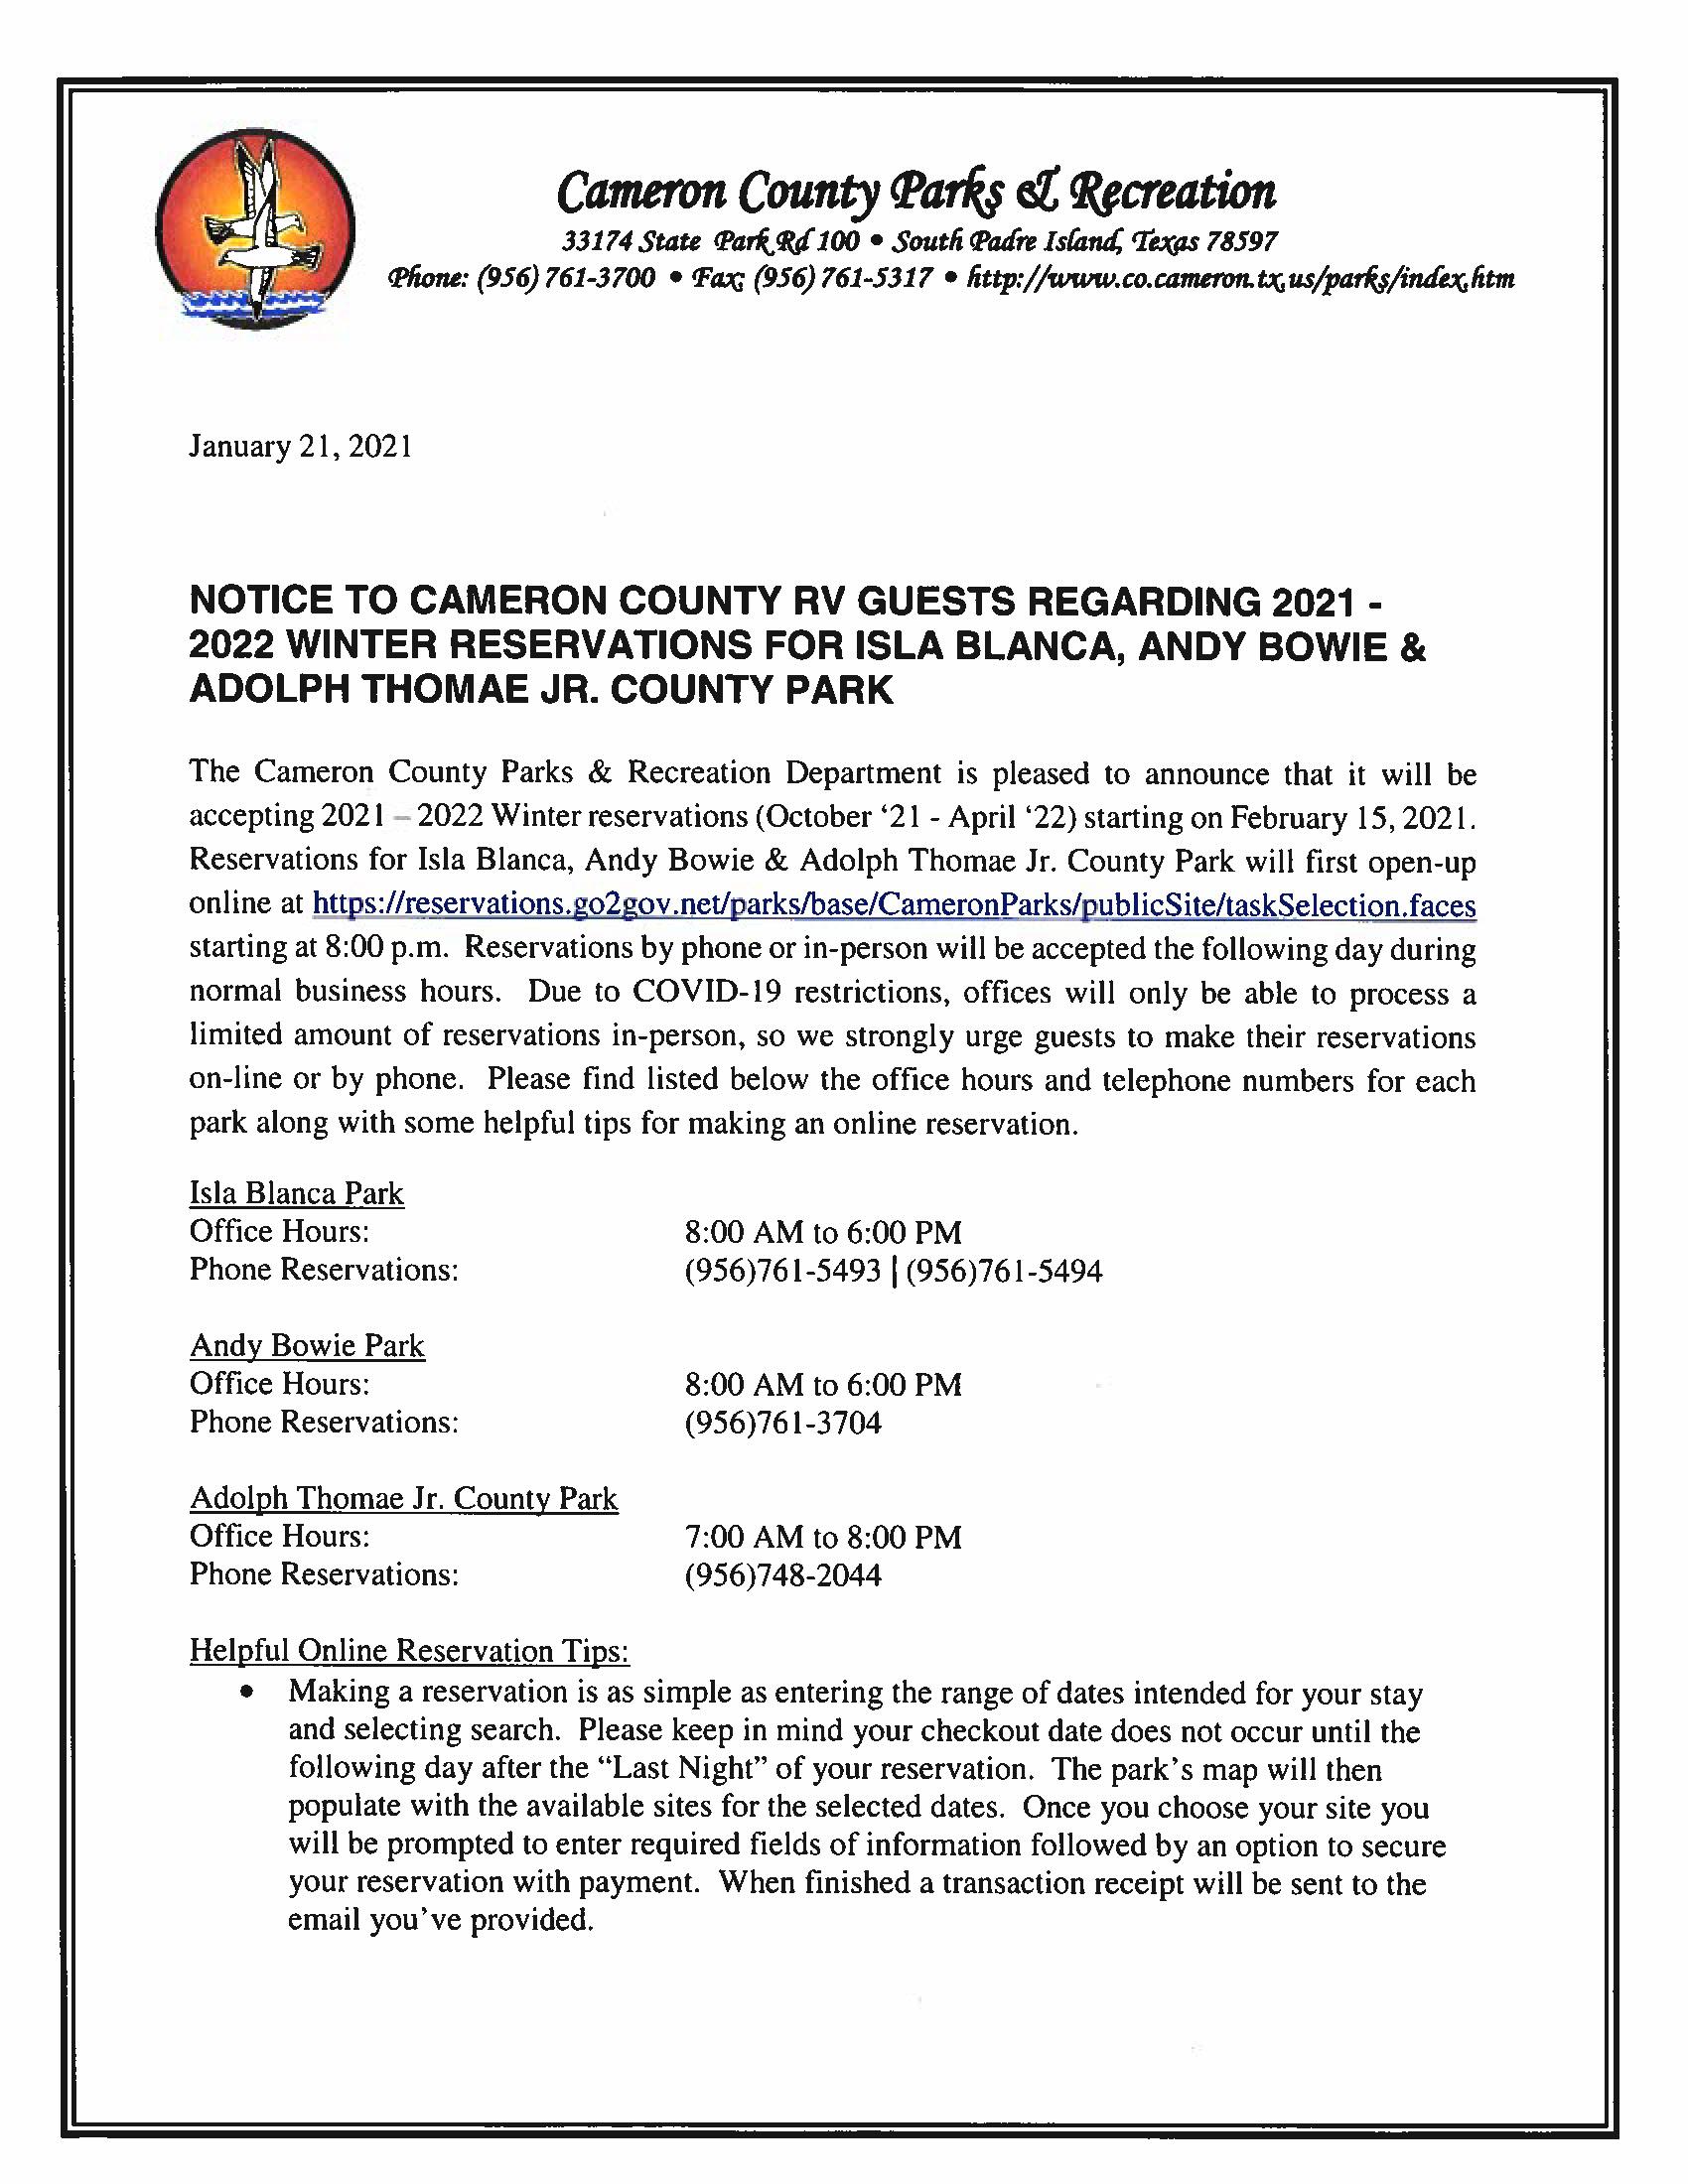 Notice to Cameron County RV Guests